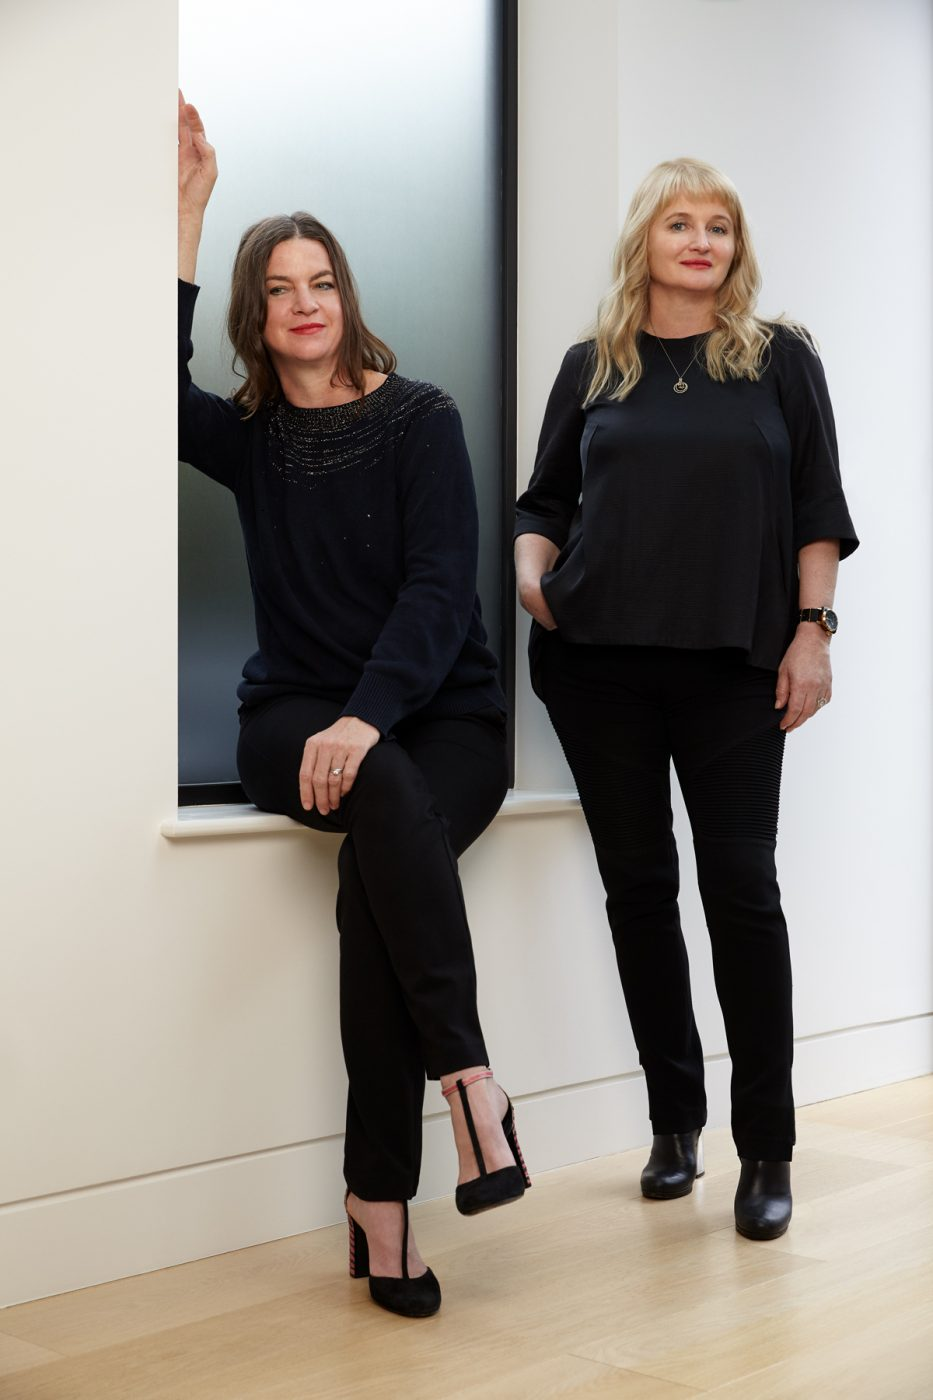 Portrait of interior designers Eleanora Cunietti and Audrey Carden